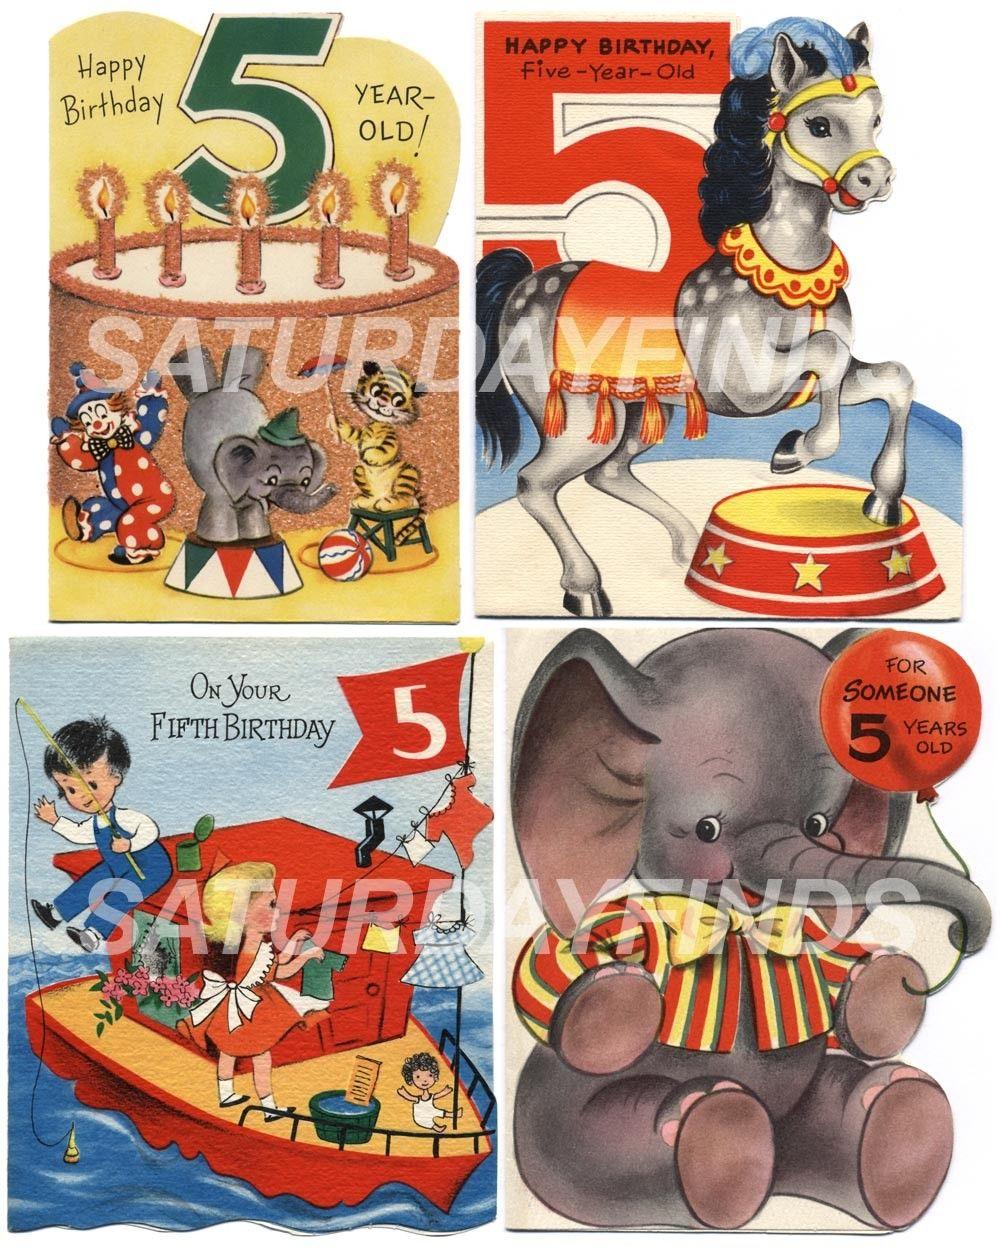 Vintage greeting cards happy birthday 5 year old no 1 of 1 vintage greeting cards happy birthday 5 year old no 1 of 1 vintage kristyandbryce Image collections